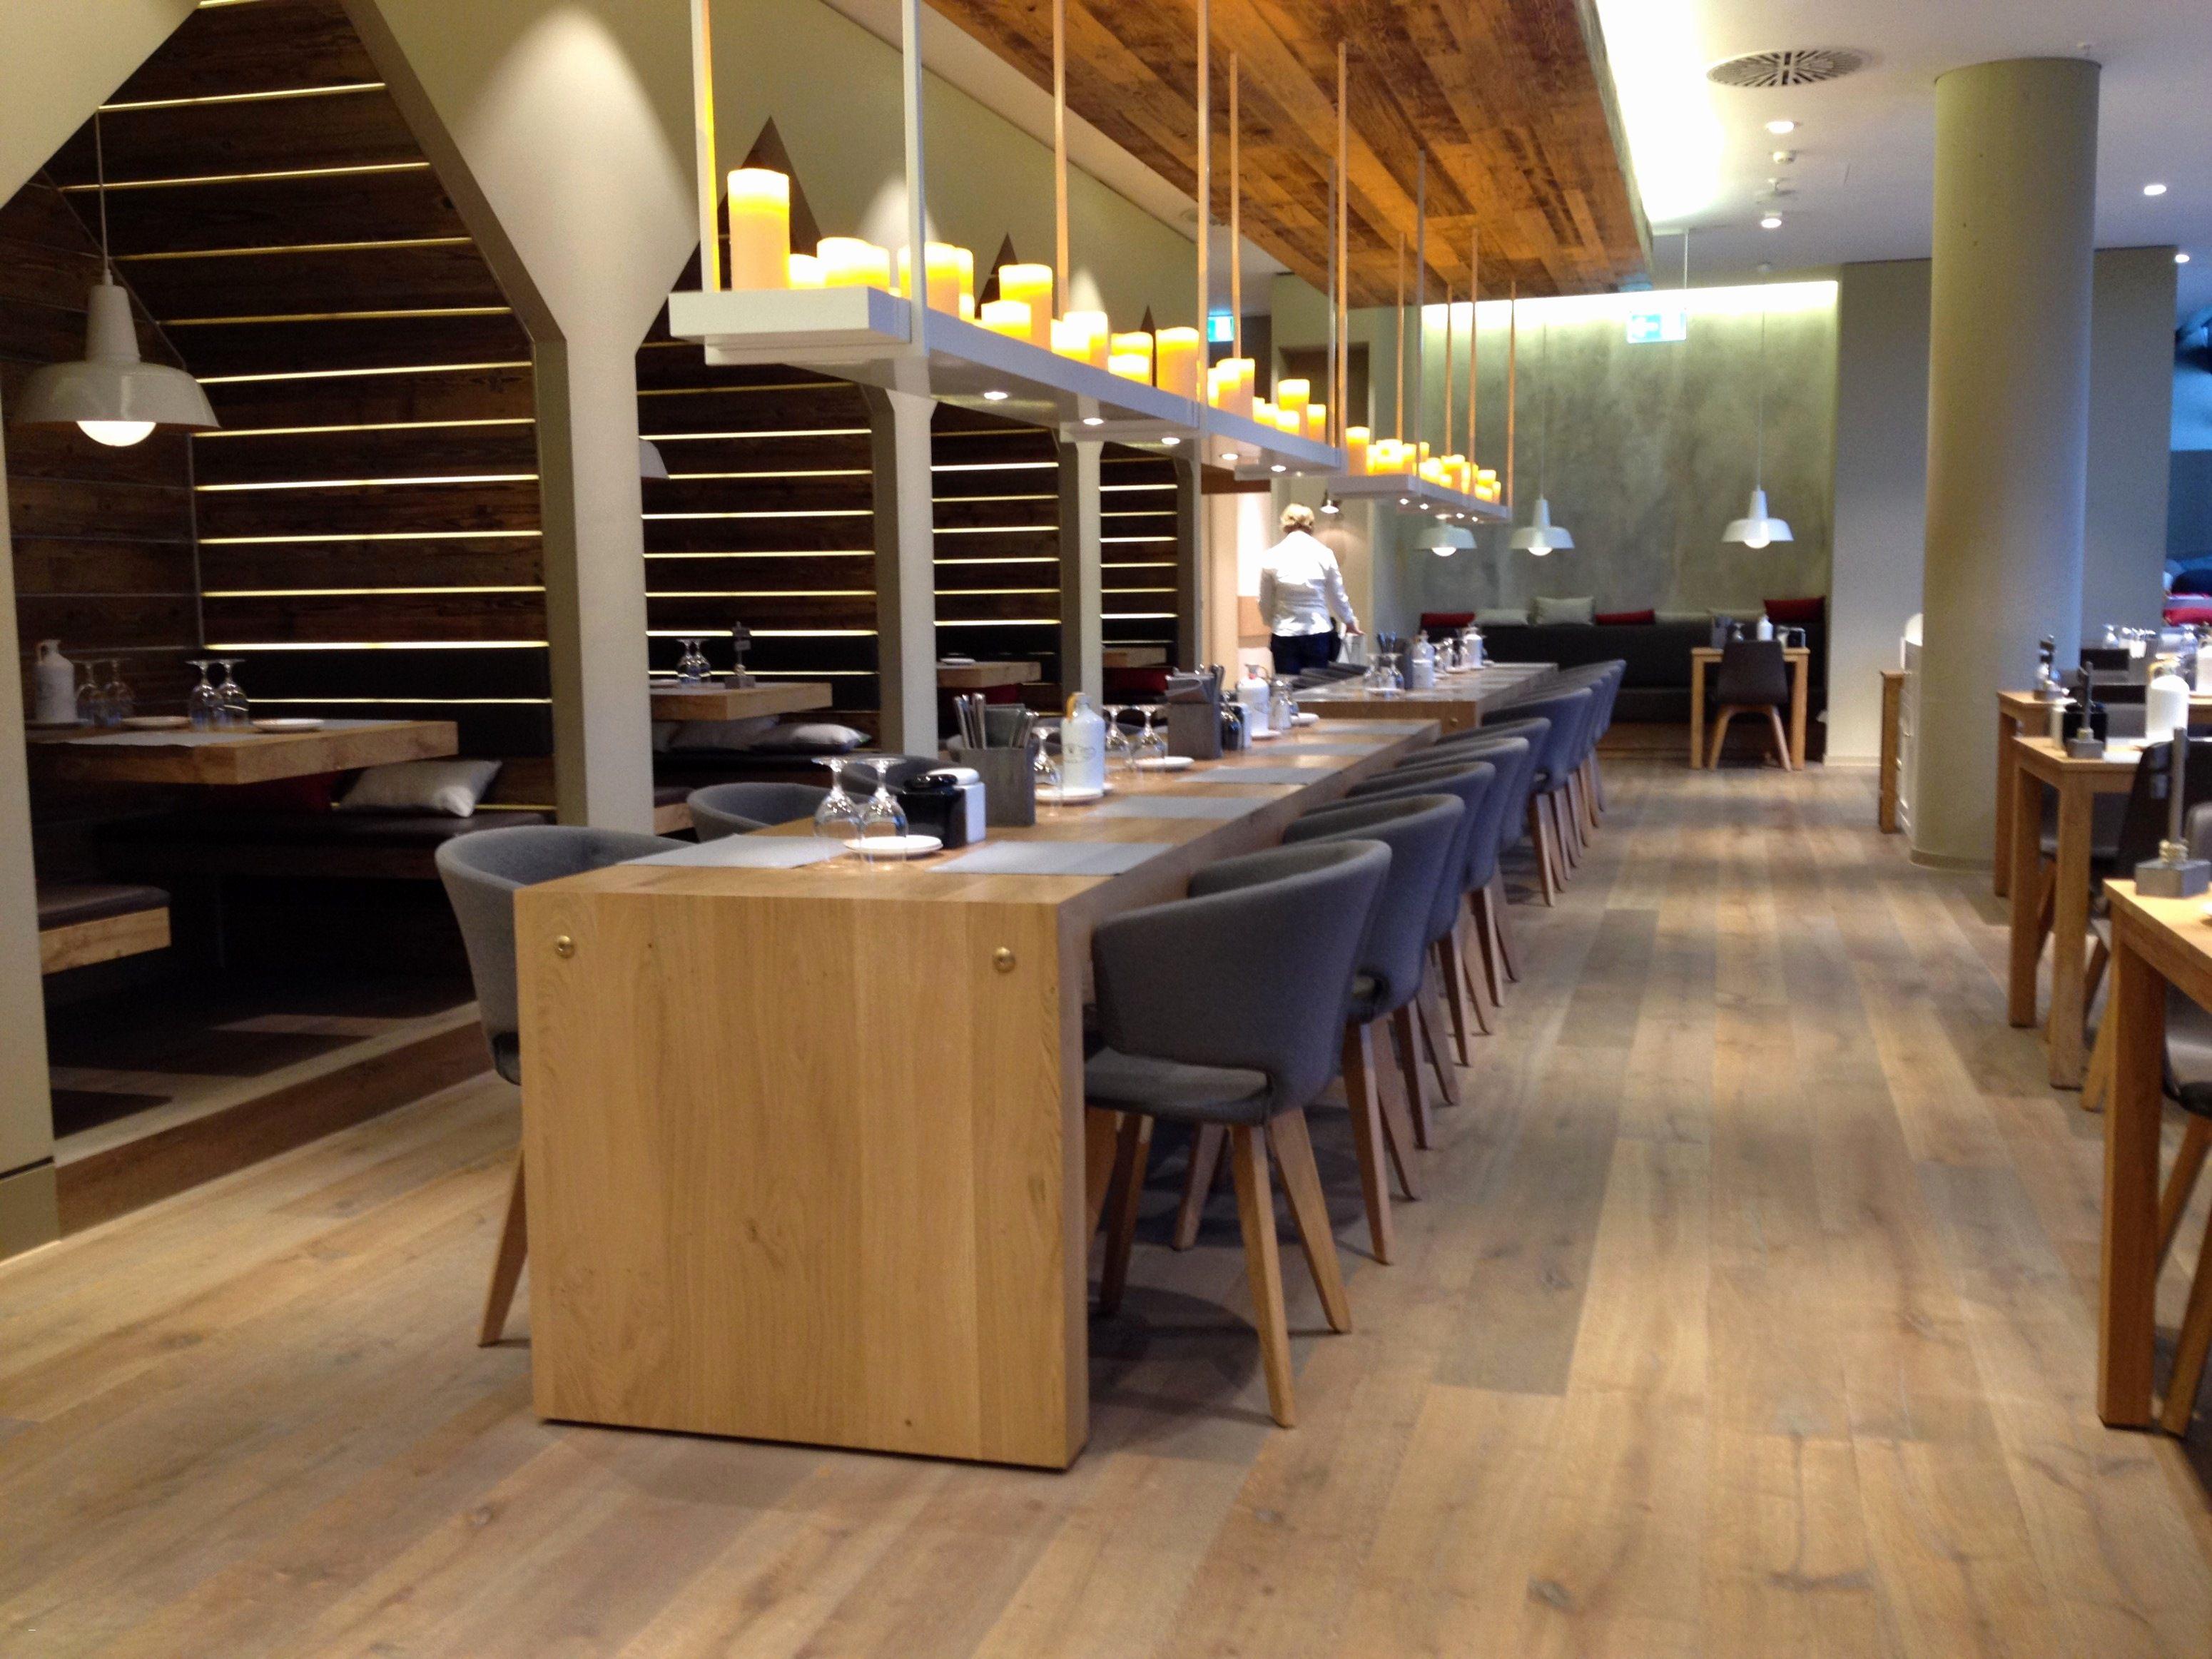 Tete De Lit Contemporaine Design Luxe High End Flooring Beautiful Tete De Lit Design Italien Lit Moderne